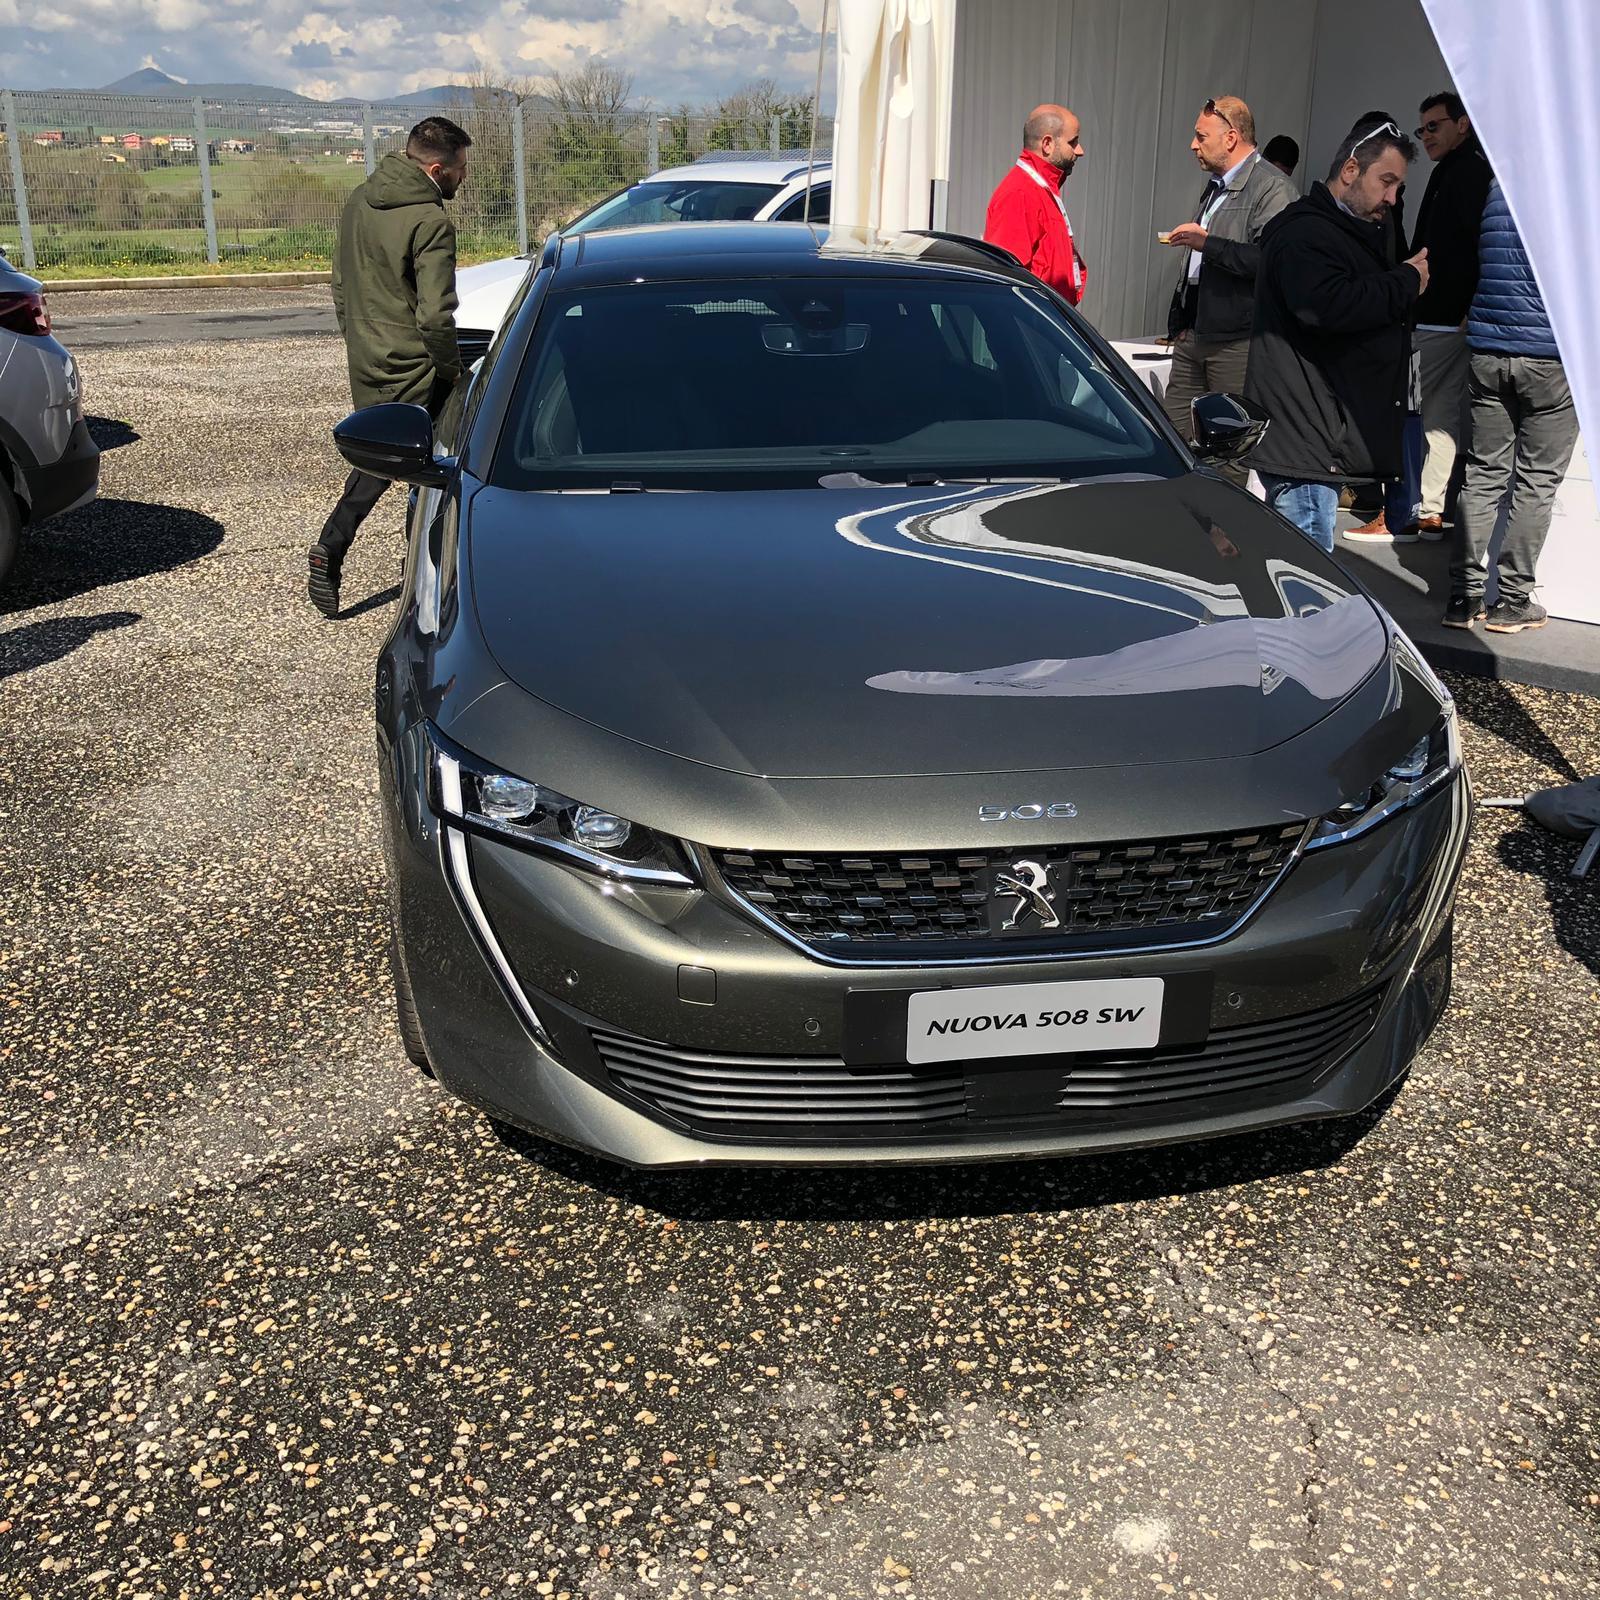 nuova-peugeot-508-sw-anteprima-fleet-motor-day-2019